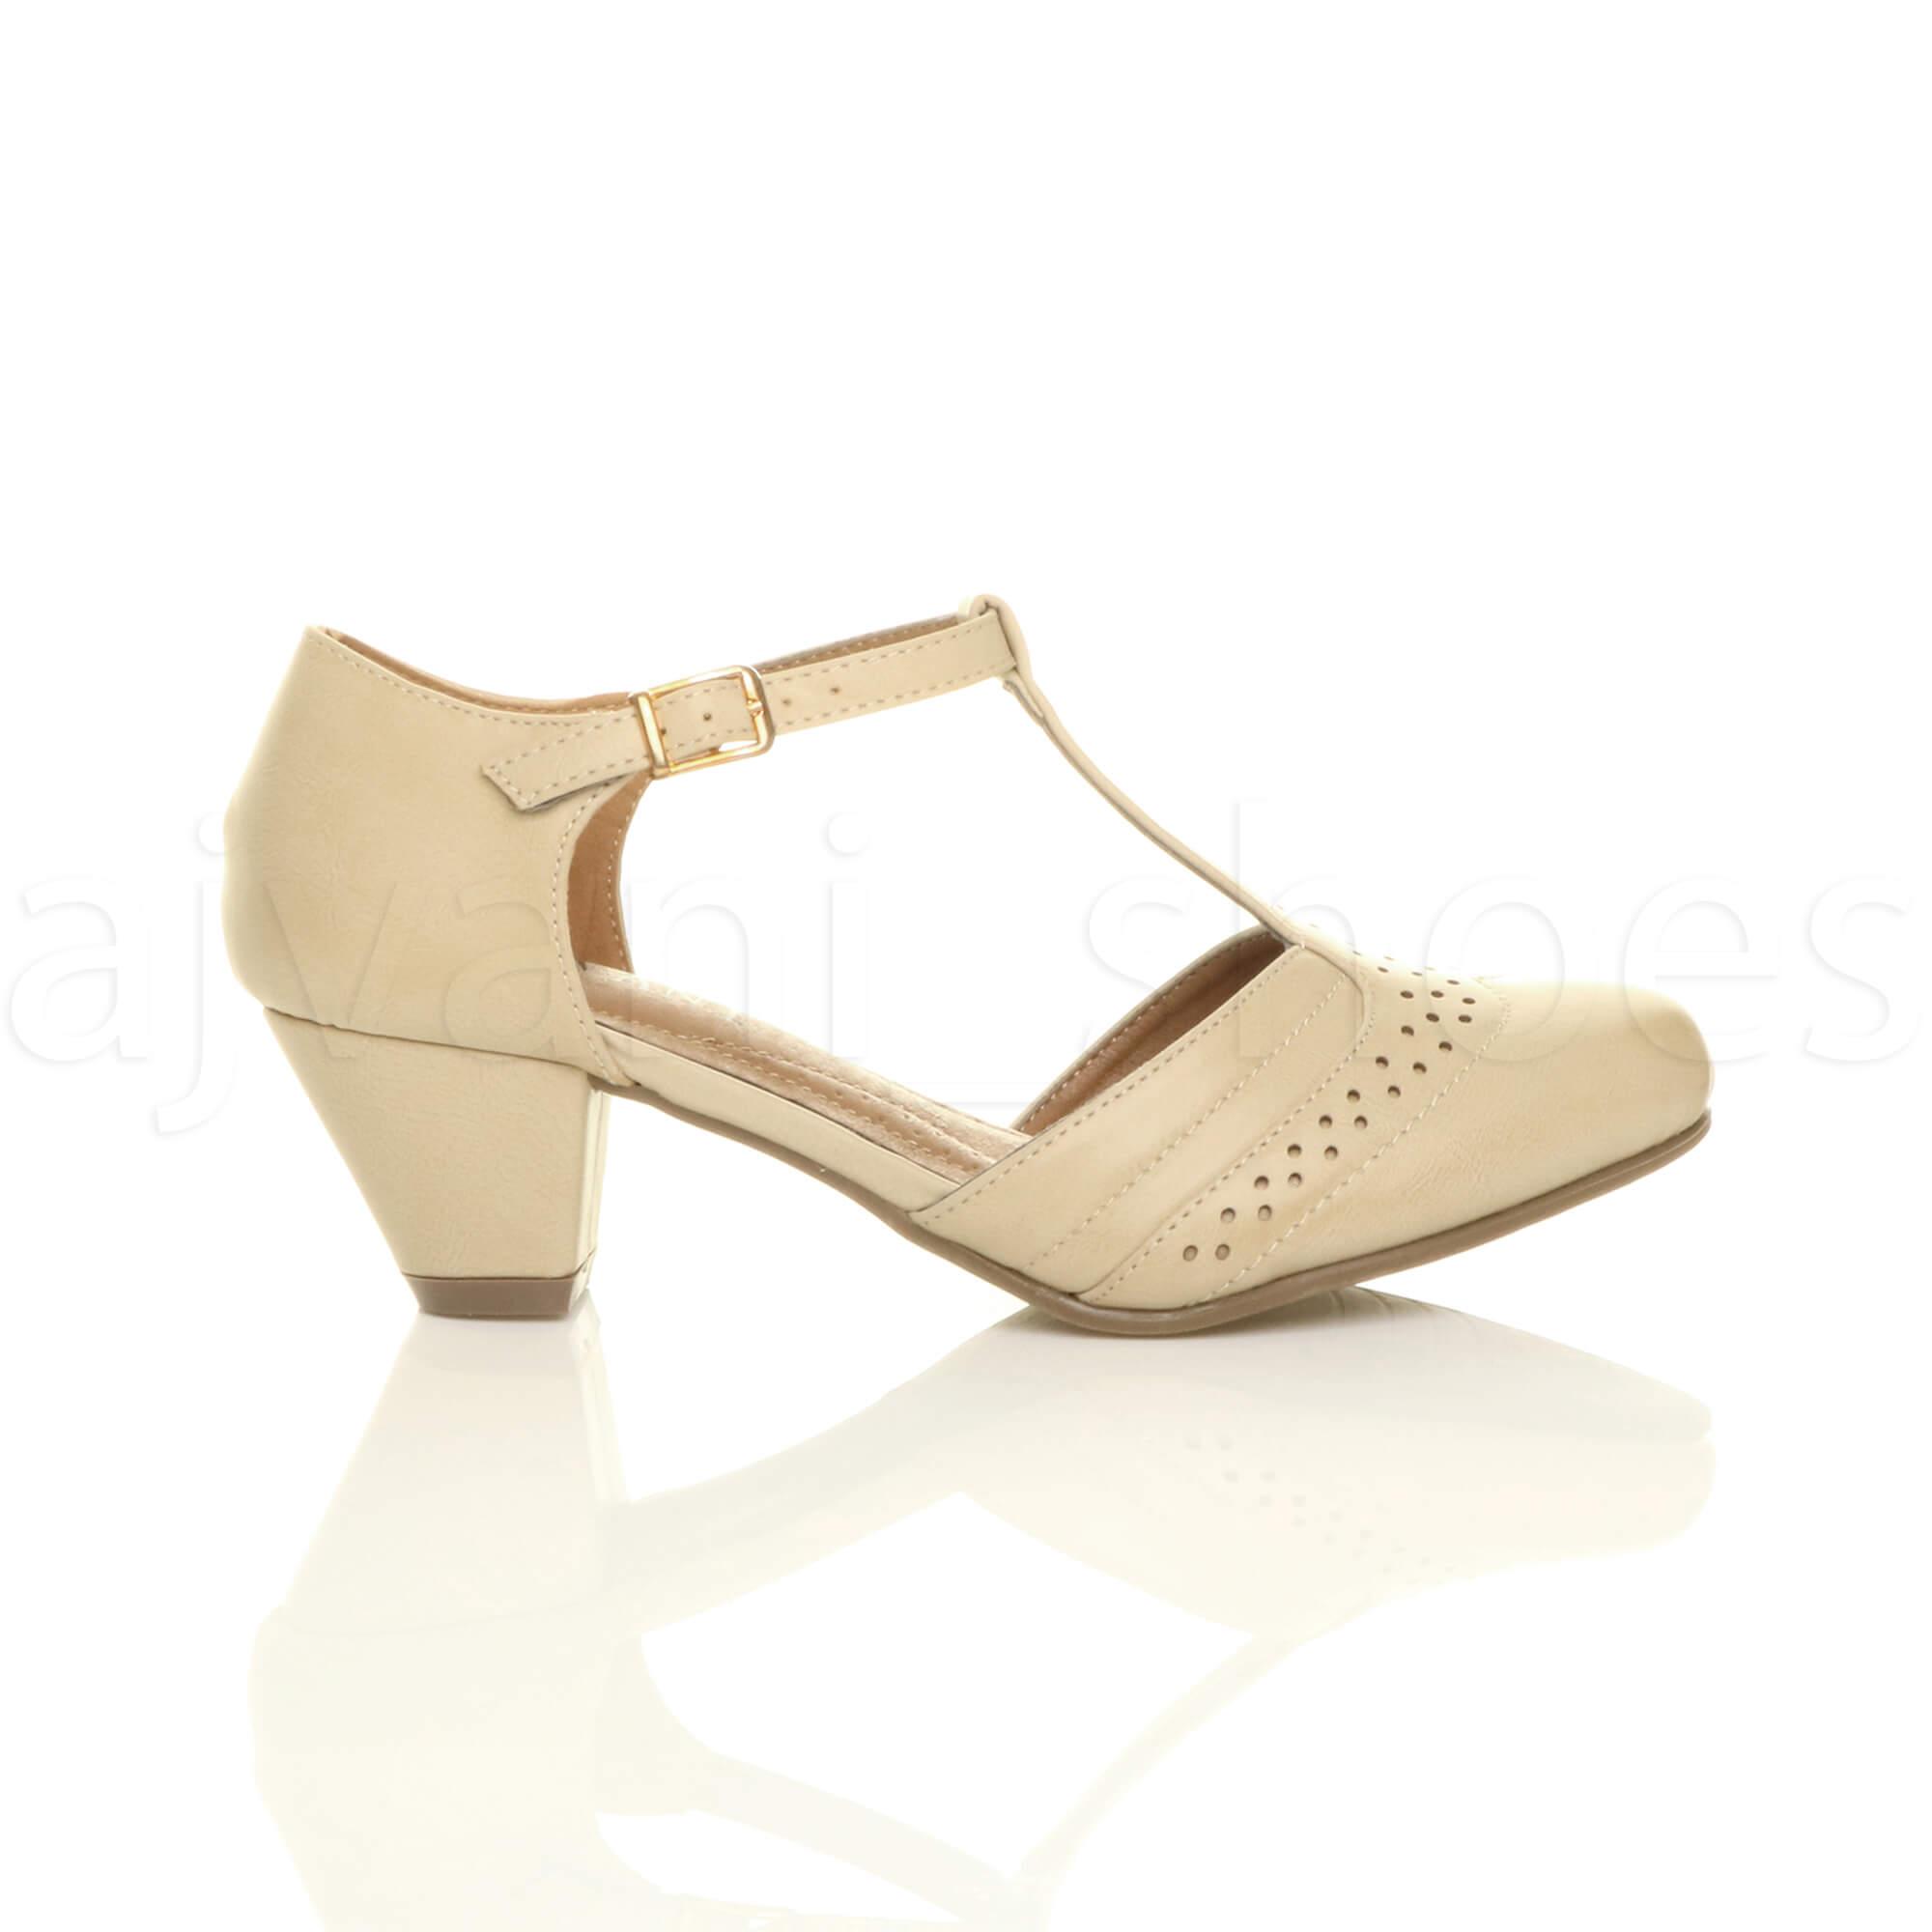 Para-mujeres-Damas-Bloque-Talon-Mediados-T-bar-corte-estilo-Tribunal-Zapatos-Sandalias-Tamano